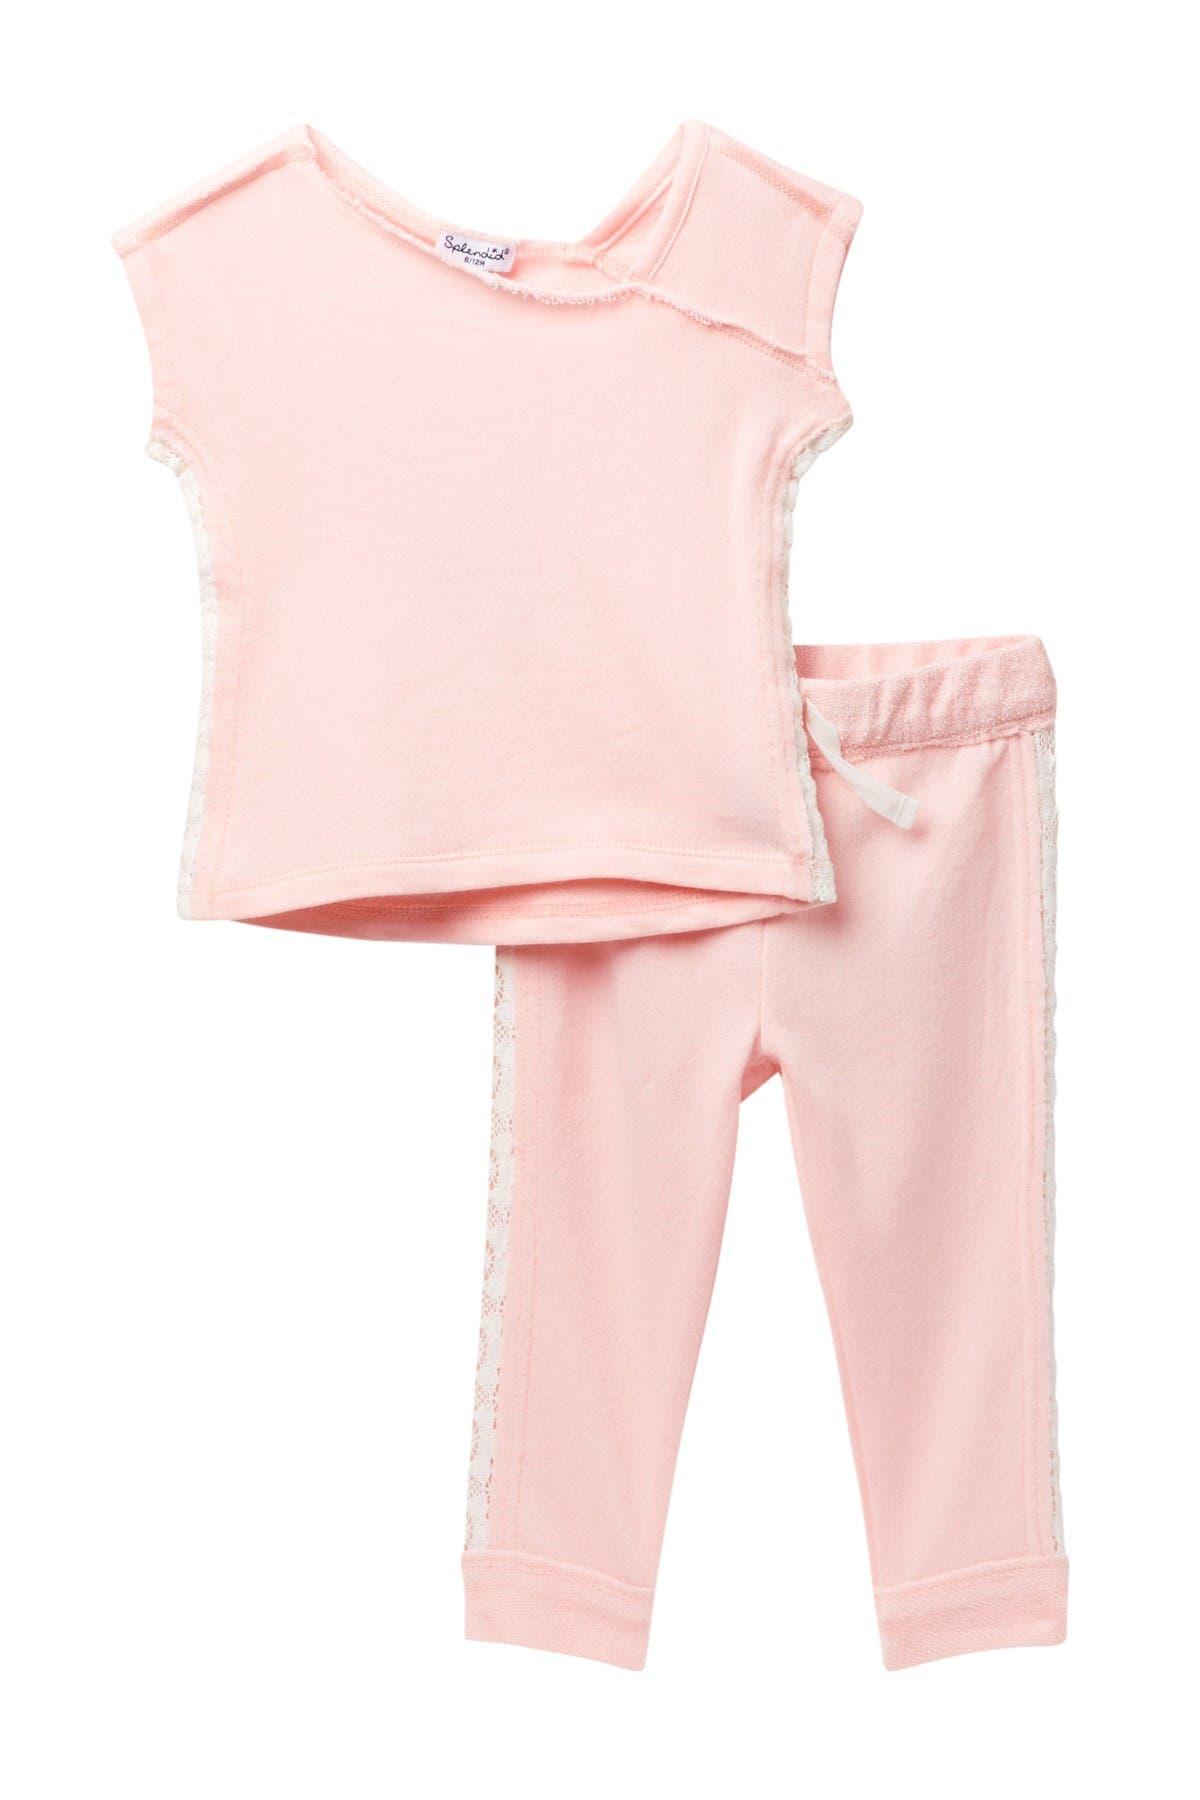 Image of Splendid Lace Sweatshirt Set